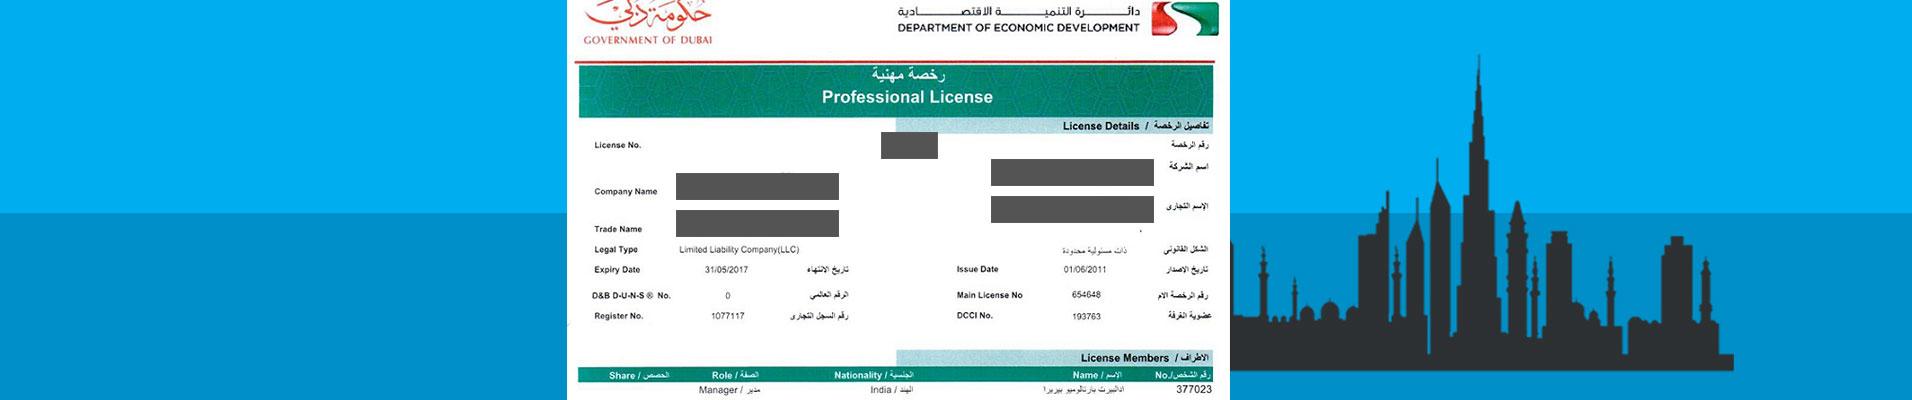 Professional Trade License in Dubai & Professional Licenses